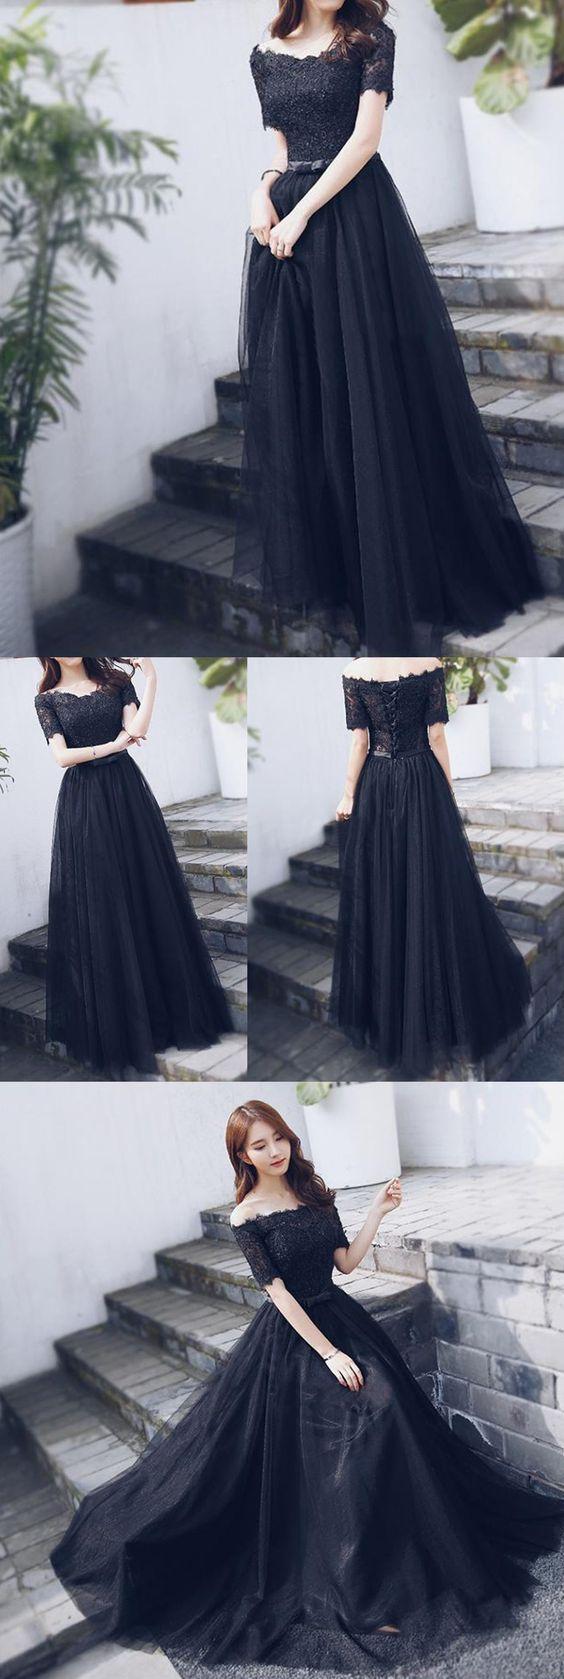 Off shoulder black lace fashion aline lace up back prom dress